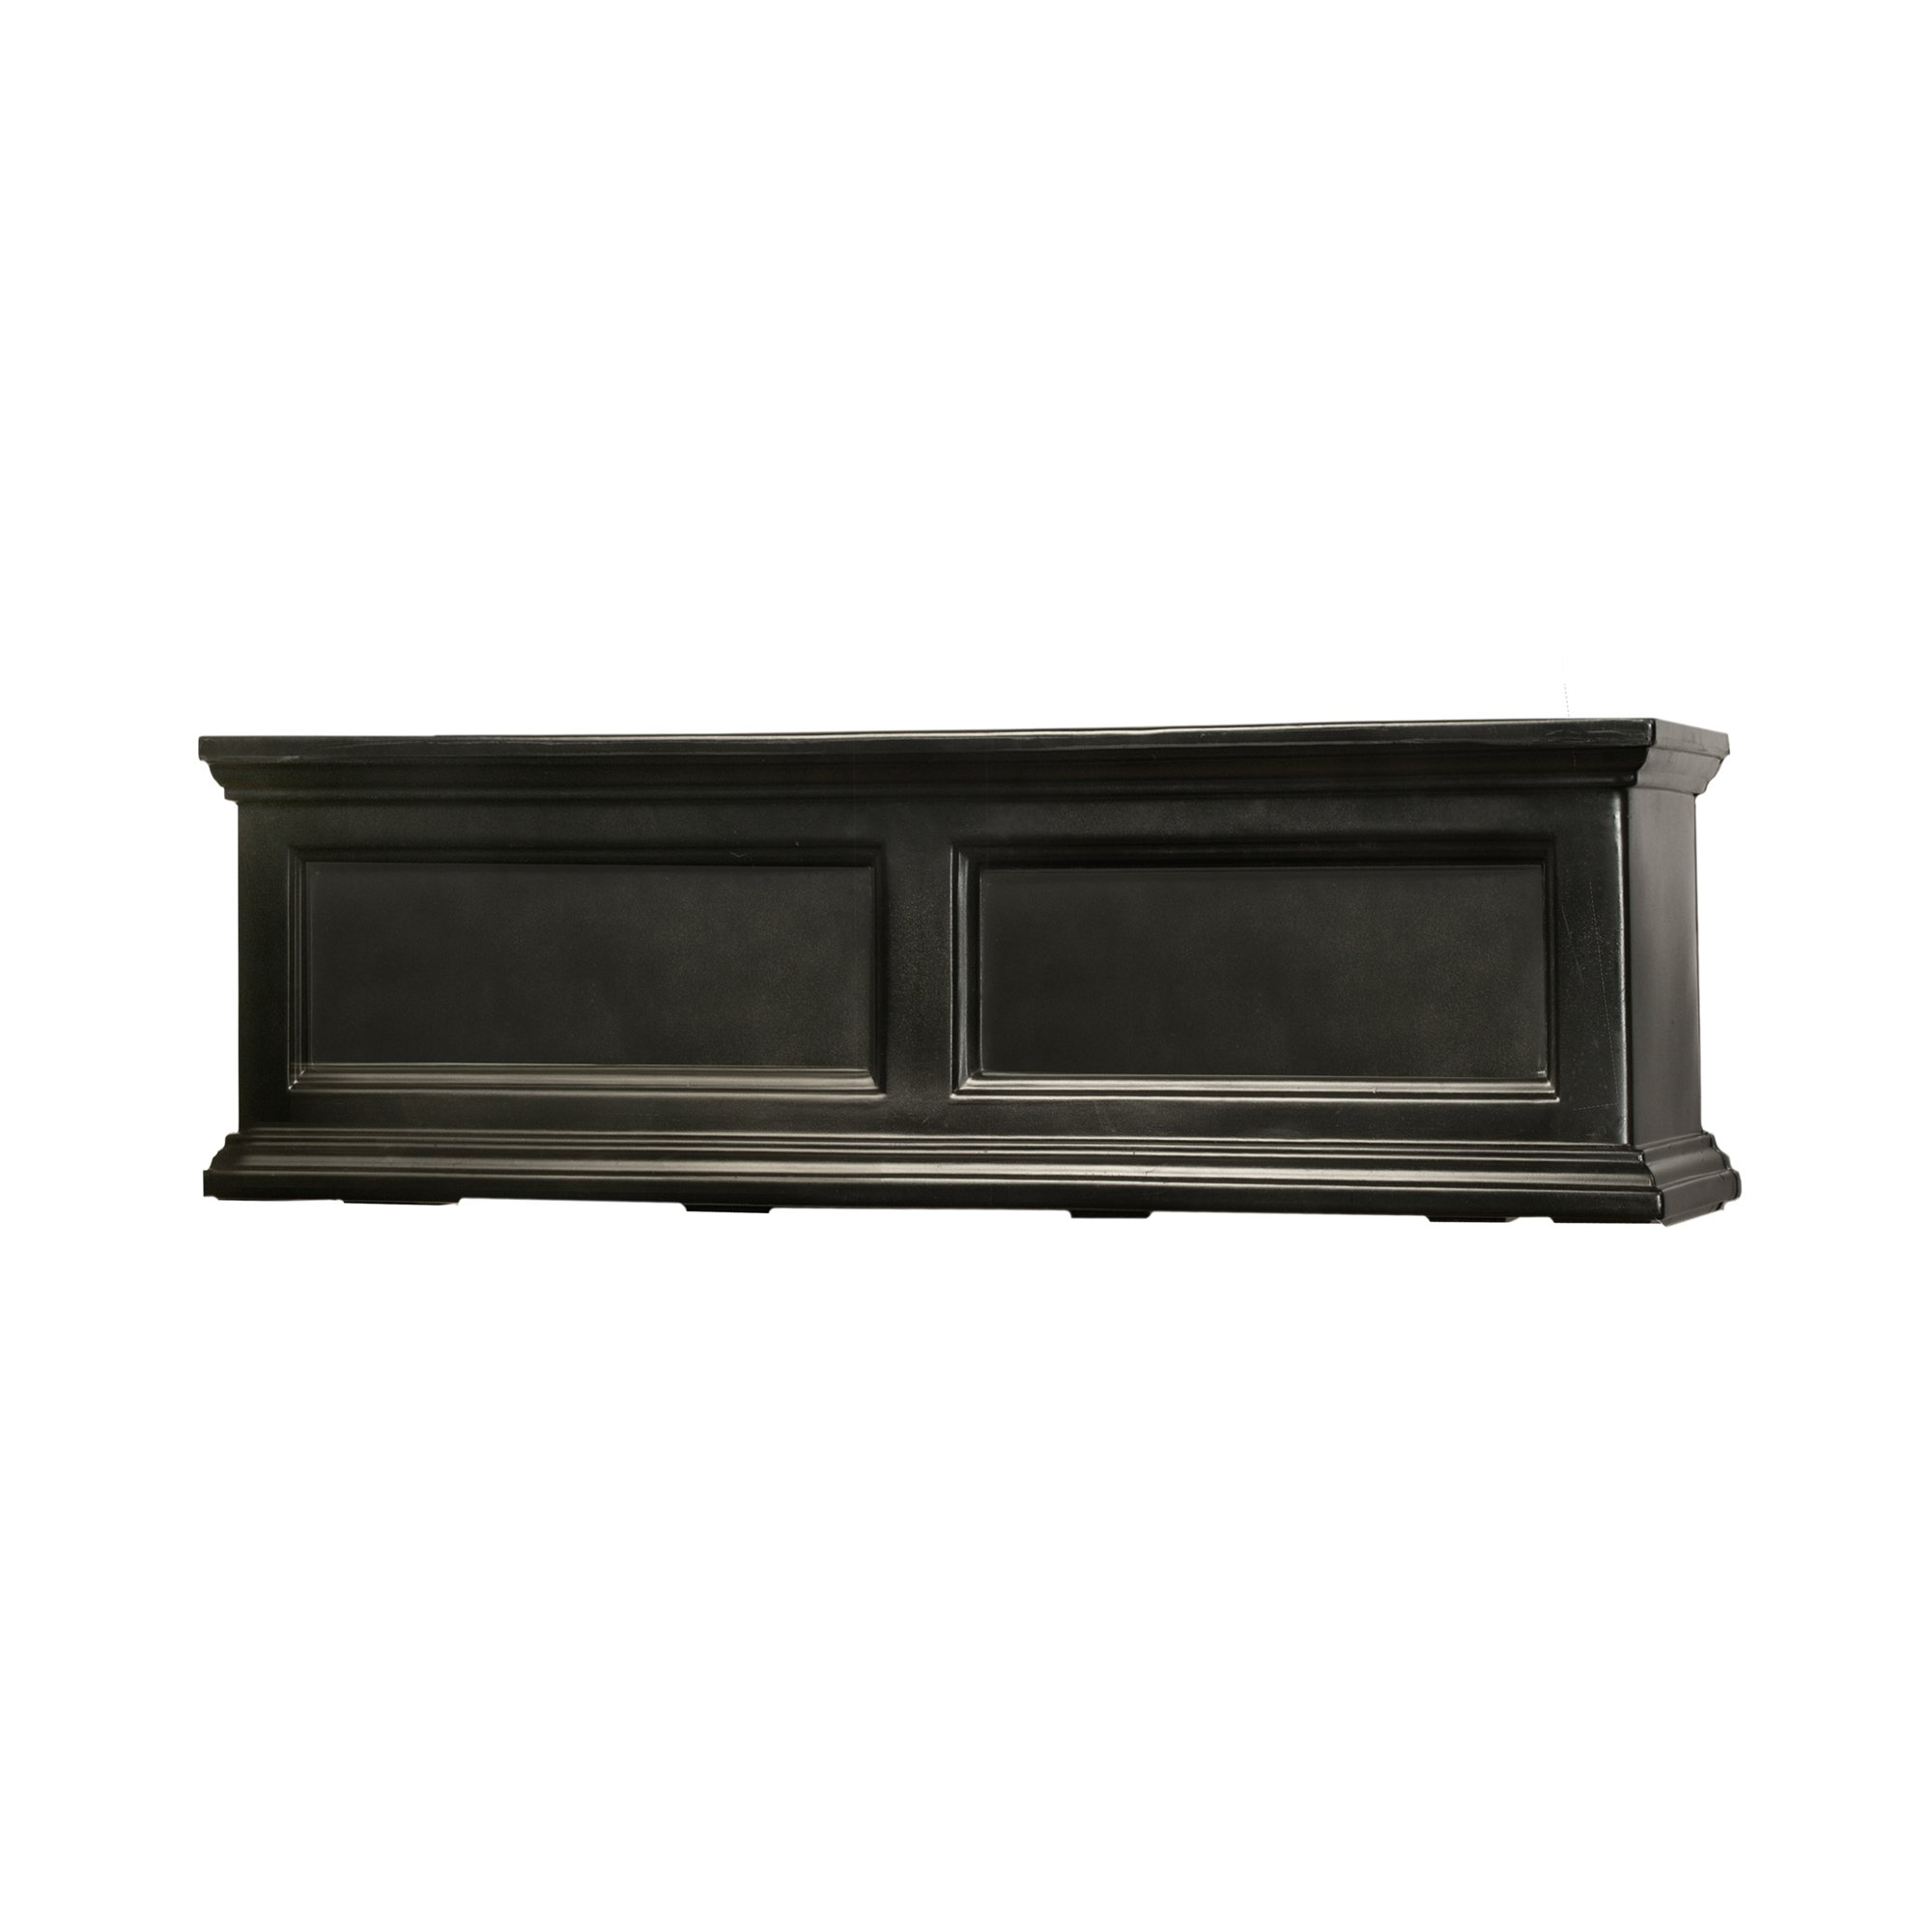 Mayne Fairfield 5822b Window Box Planter 3 Foot Black Buy Online In Belize At Belize Desertcart Com Productid 11762350